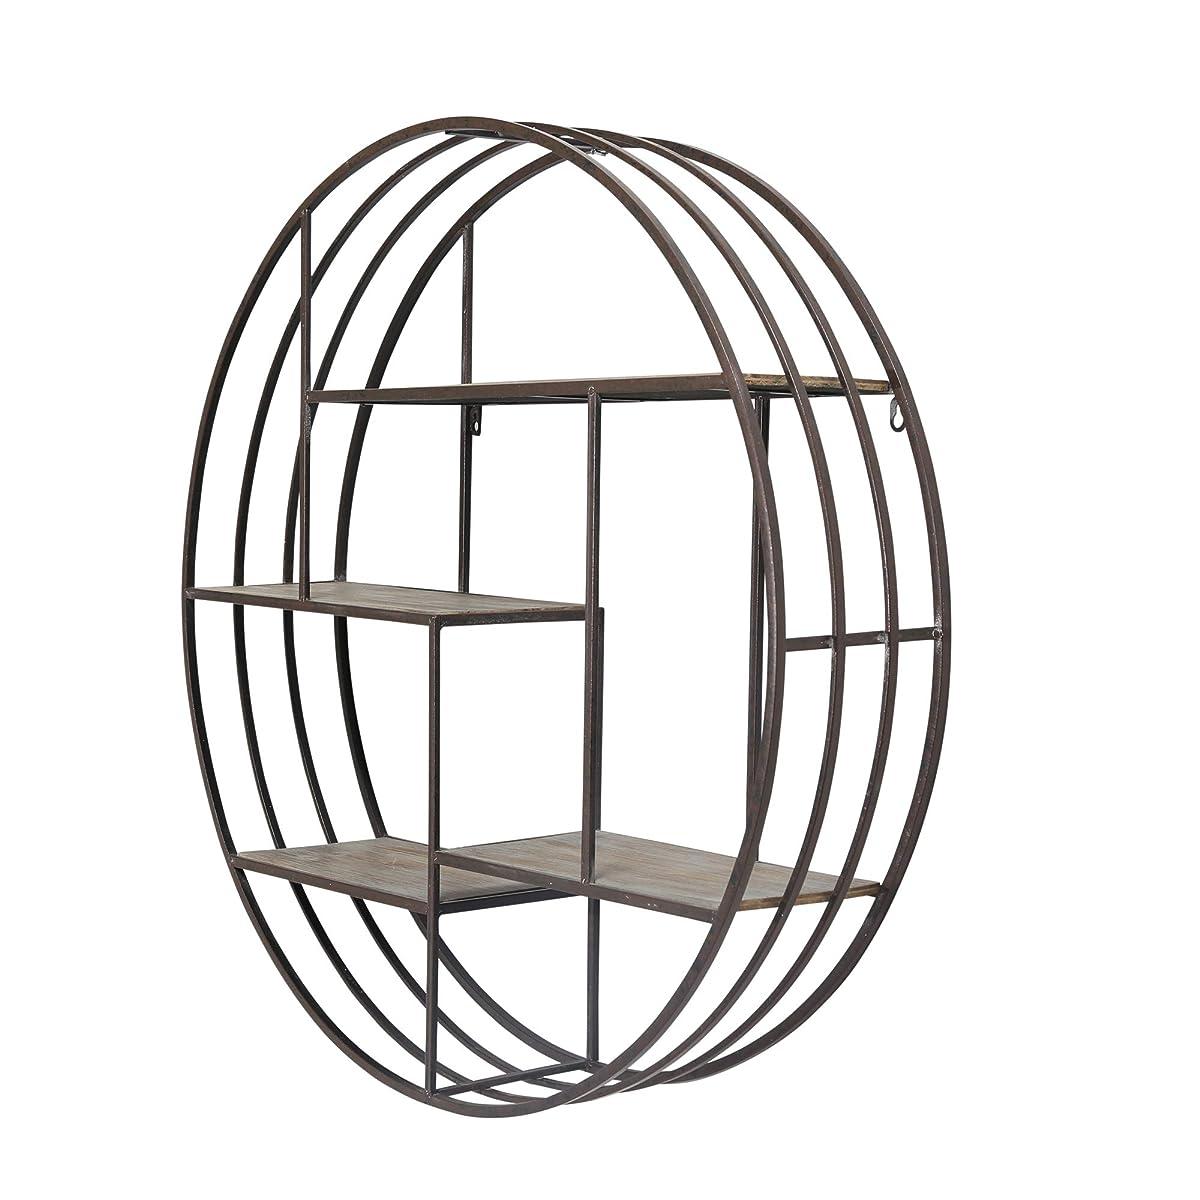 Sagebrook Home 11050 Metal & Wood Wall Shelf, Brown Metal, 31.5 x 7.25 x 31.5 Inches